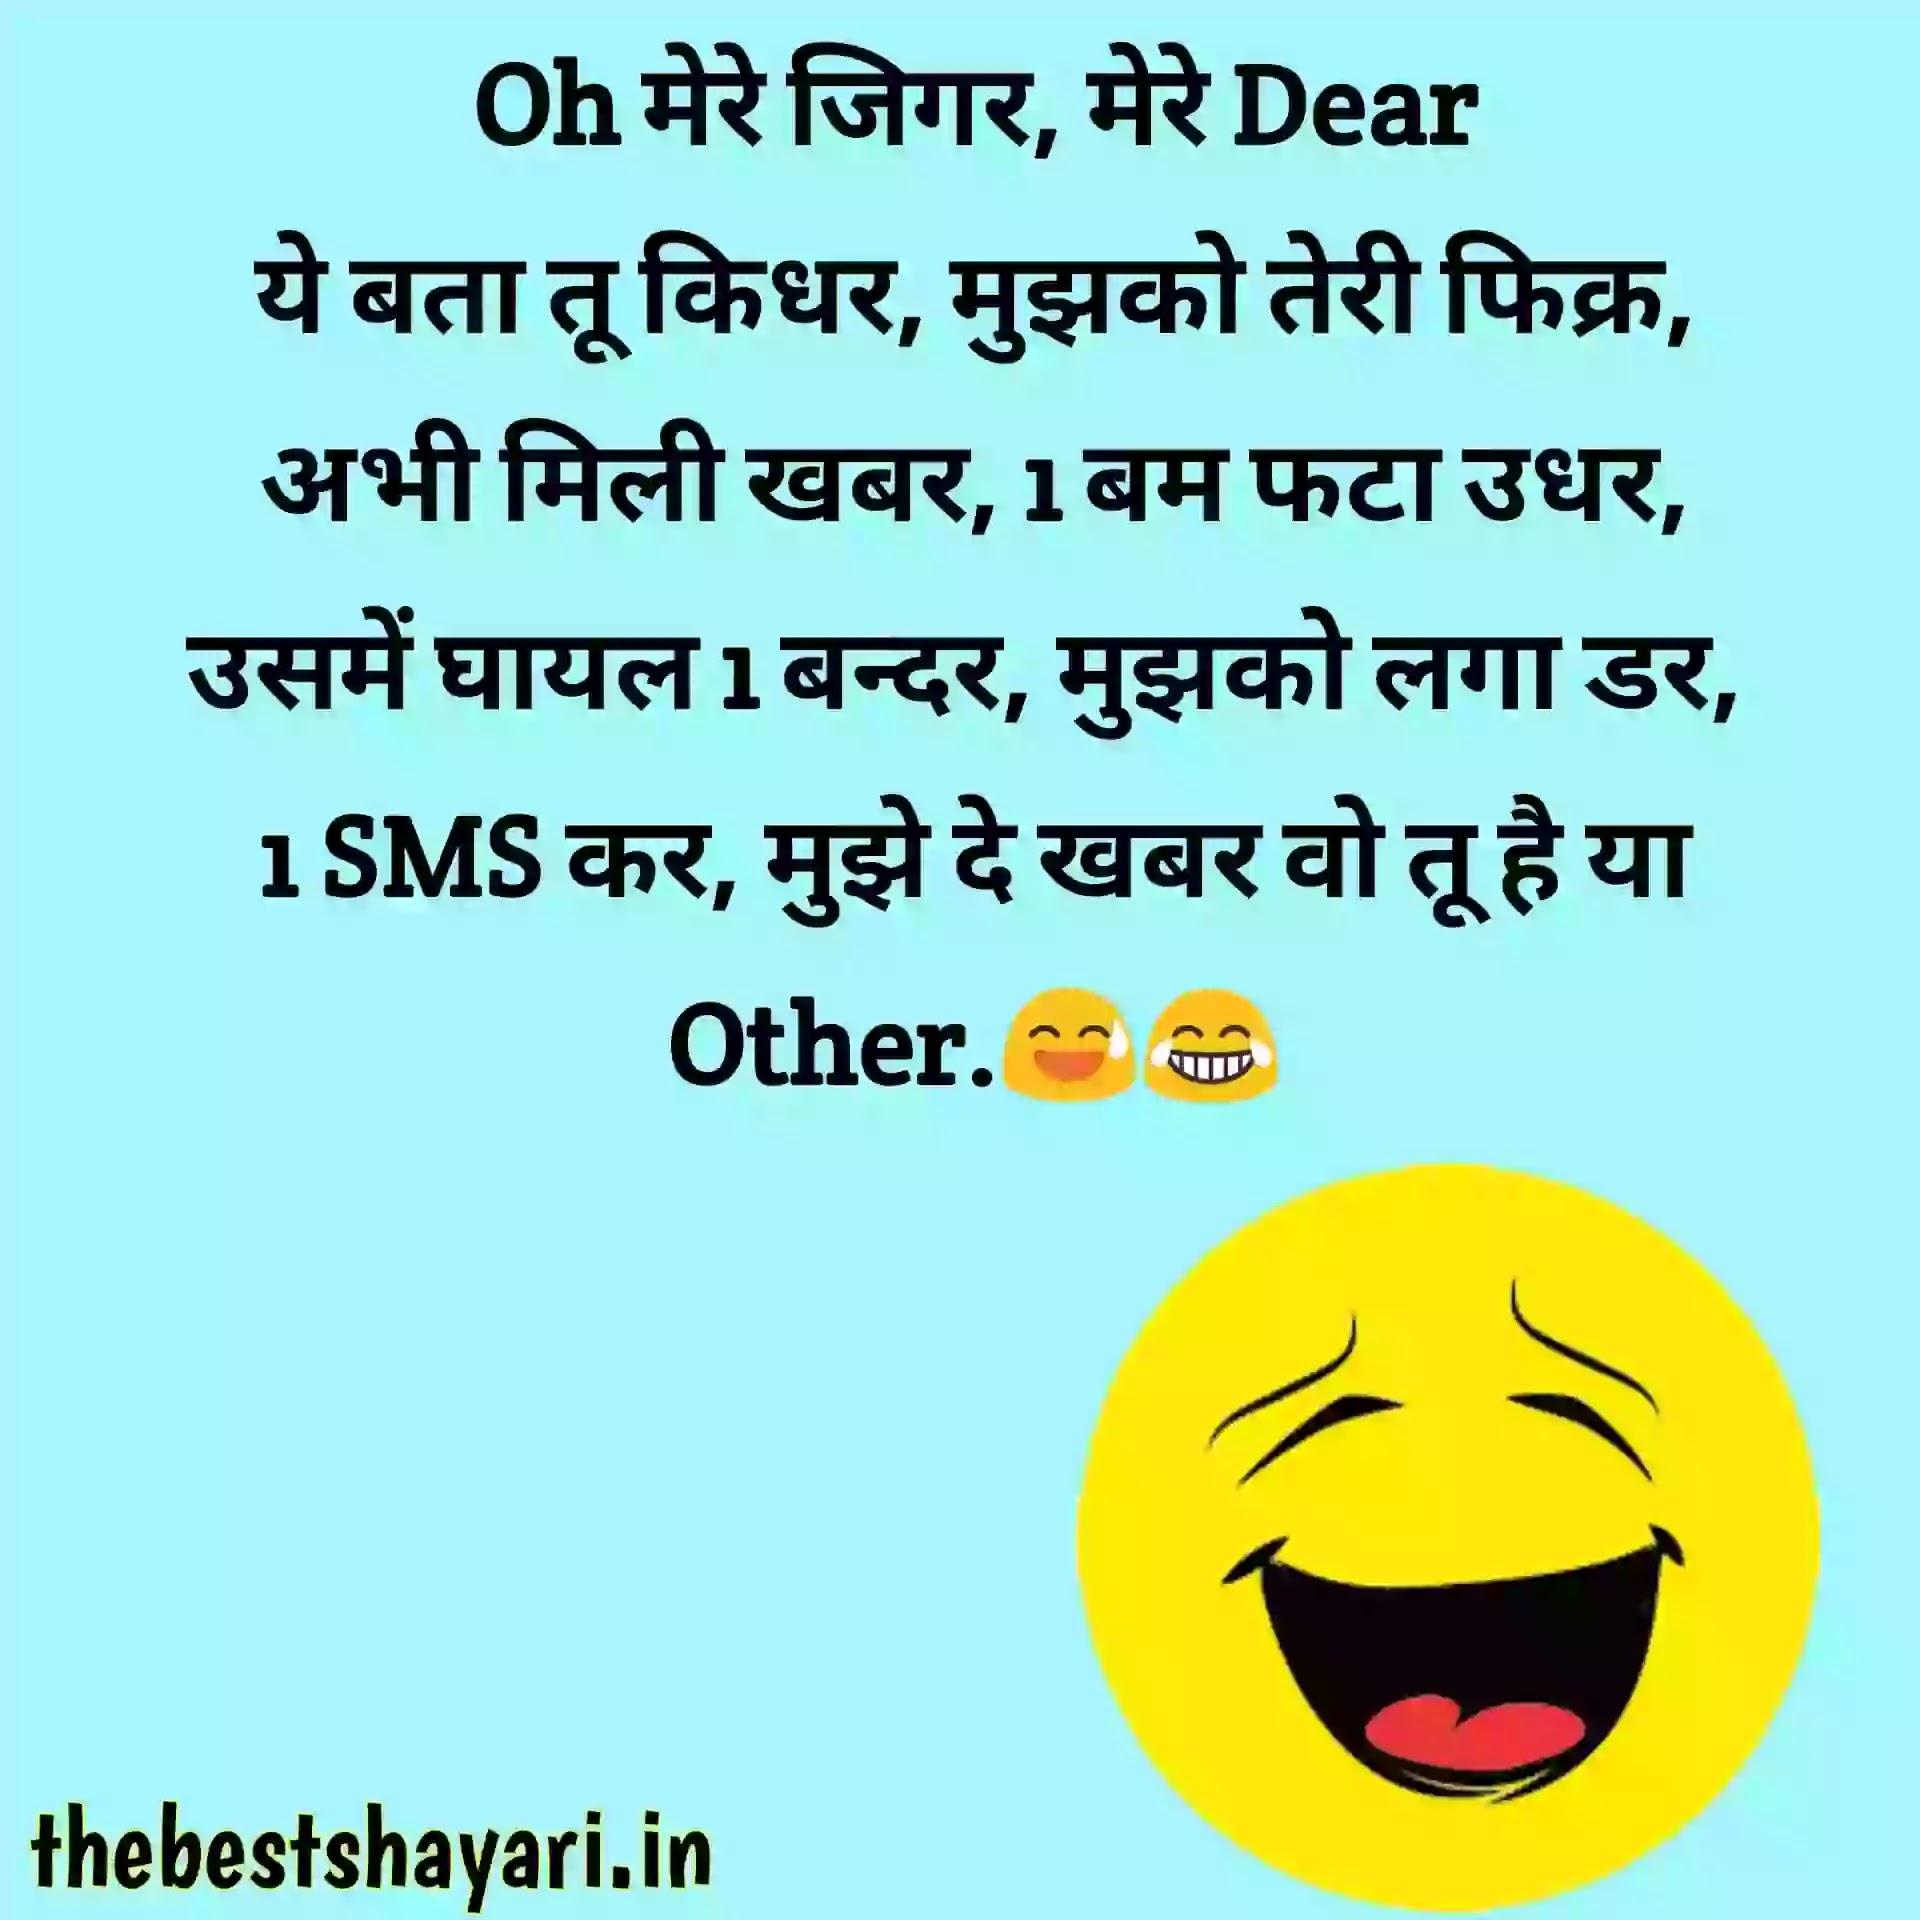 Hindi funny shayari for friends